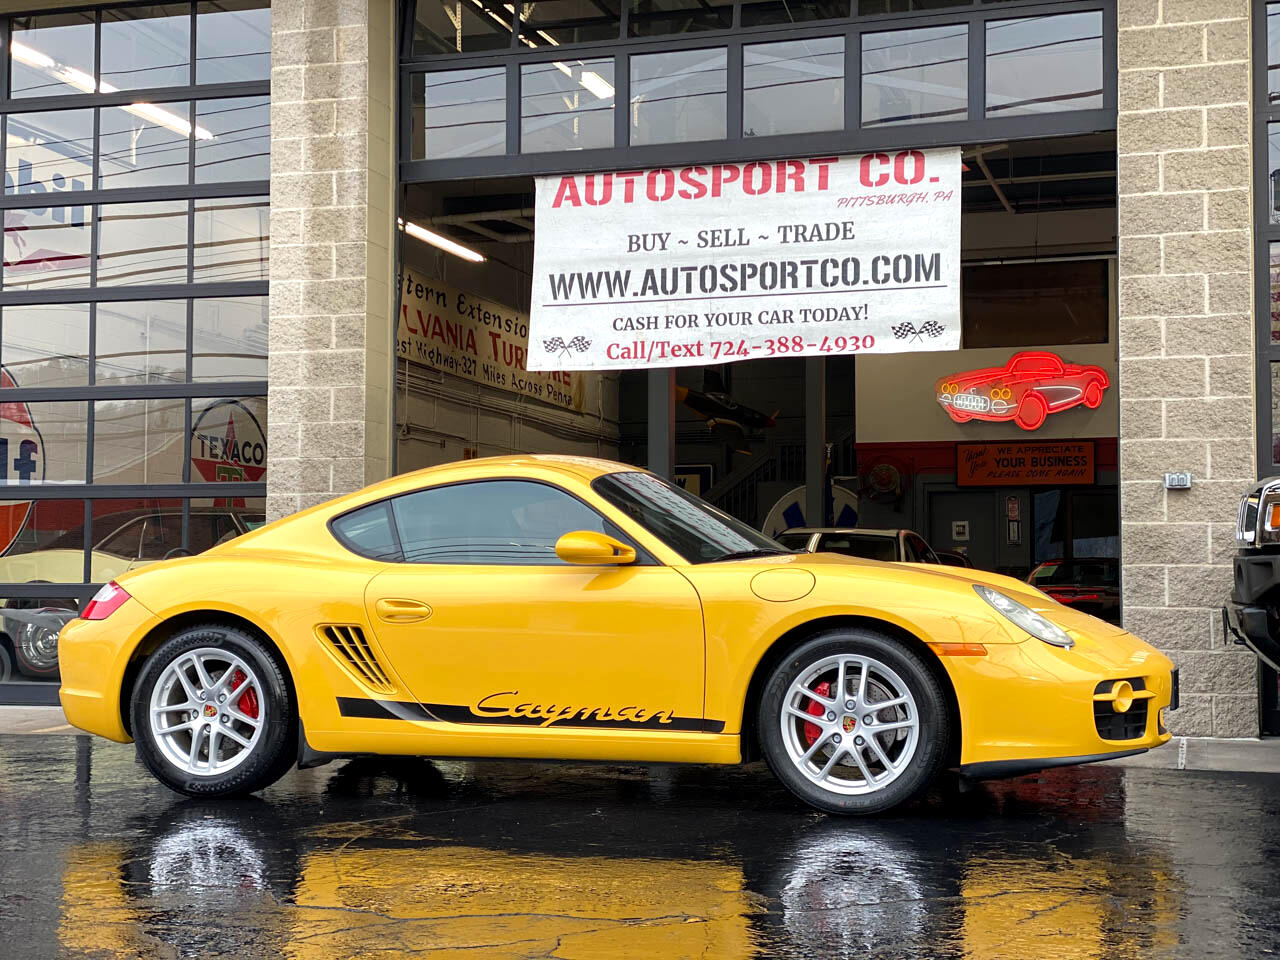 2007 Porsche Cayman Speed Yellow ~ 29K Miles ~ Rear Wiper Option !!